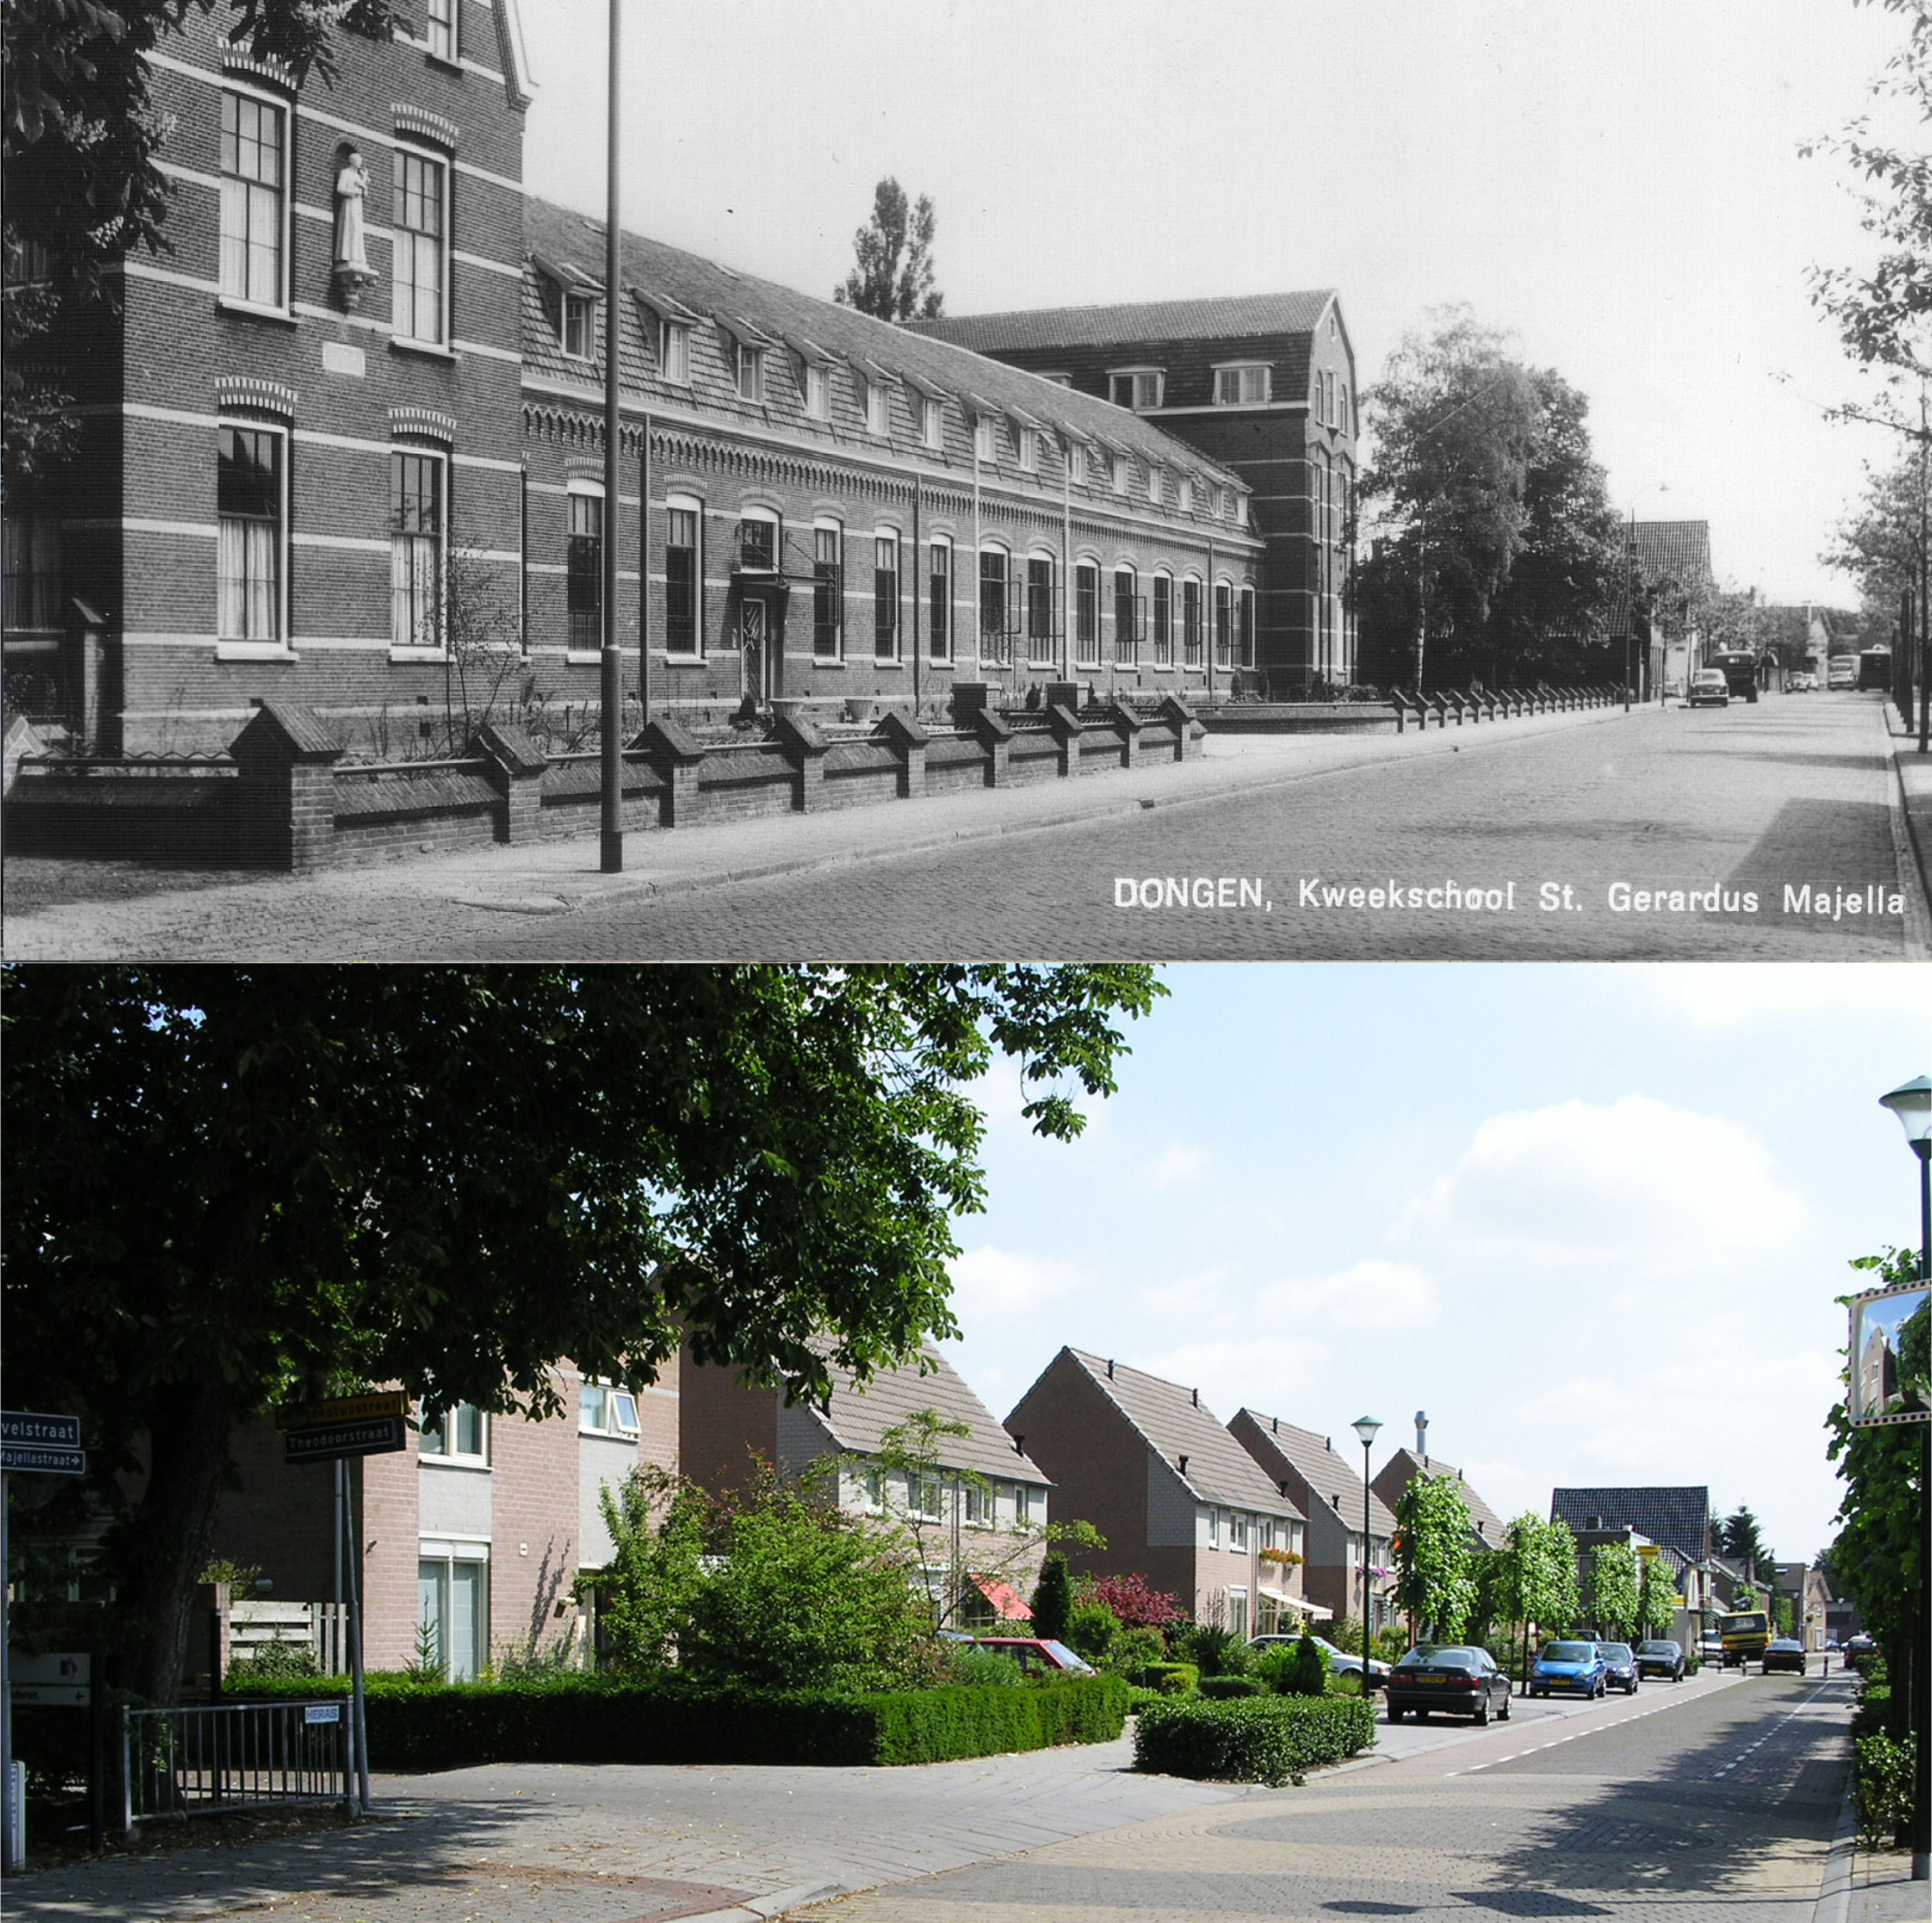 Gerardus Majellastraat - Kweekschool